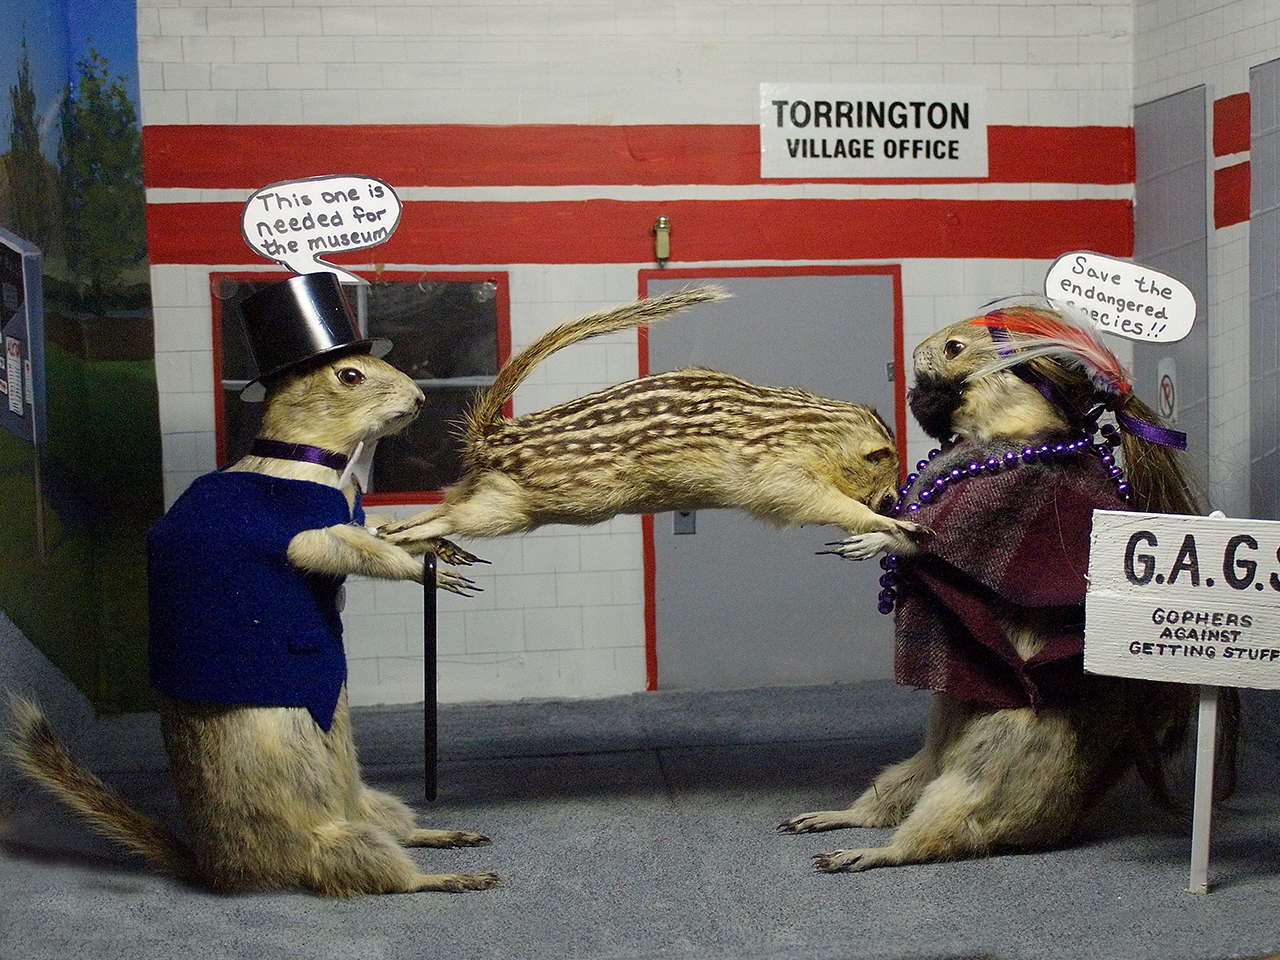 3 gophers in activist diorama scene